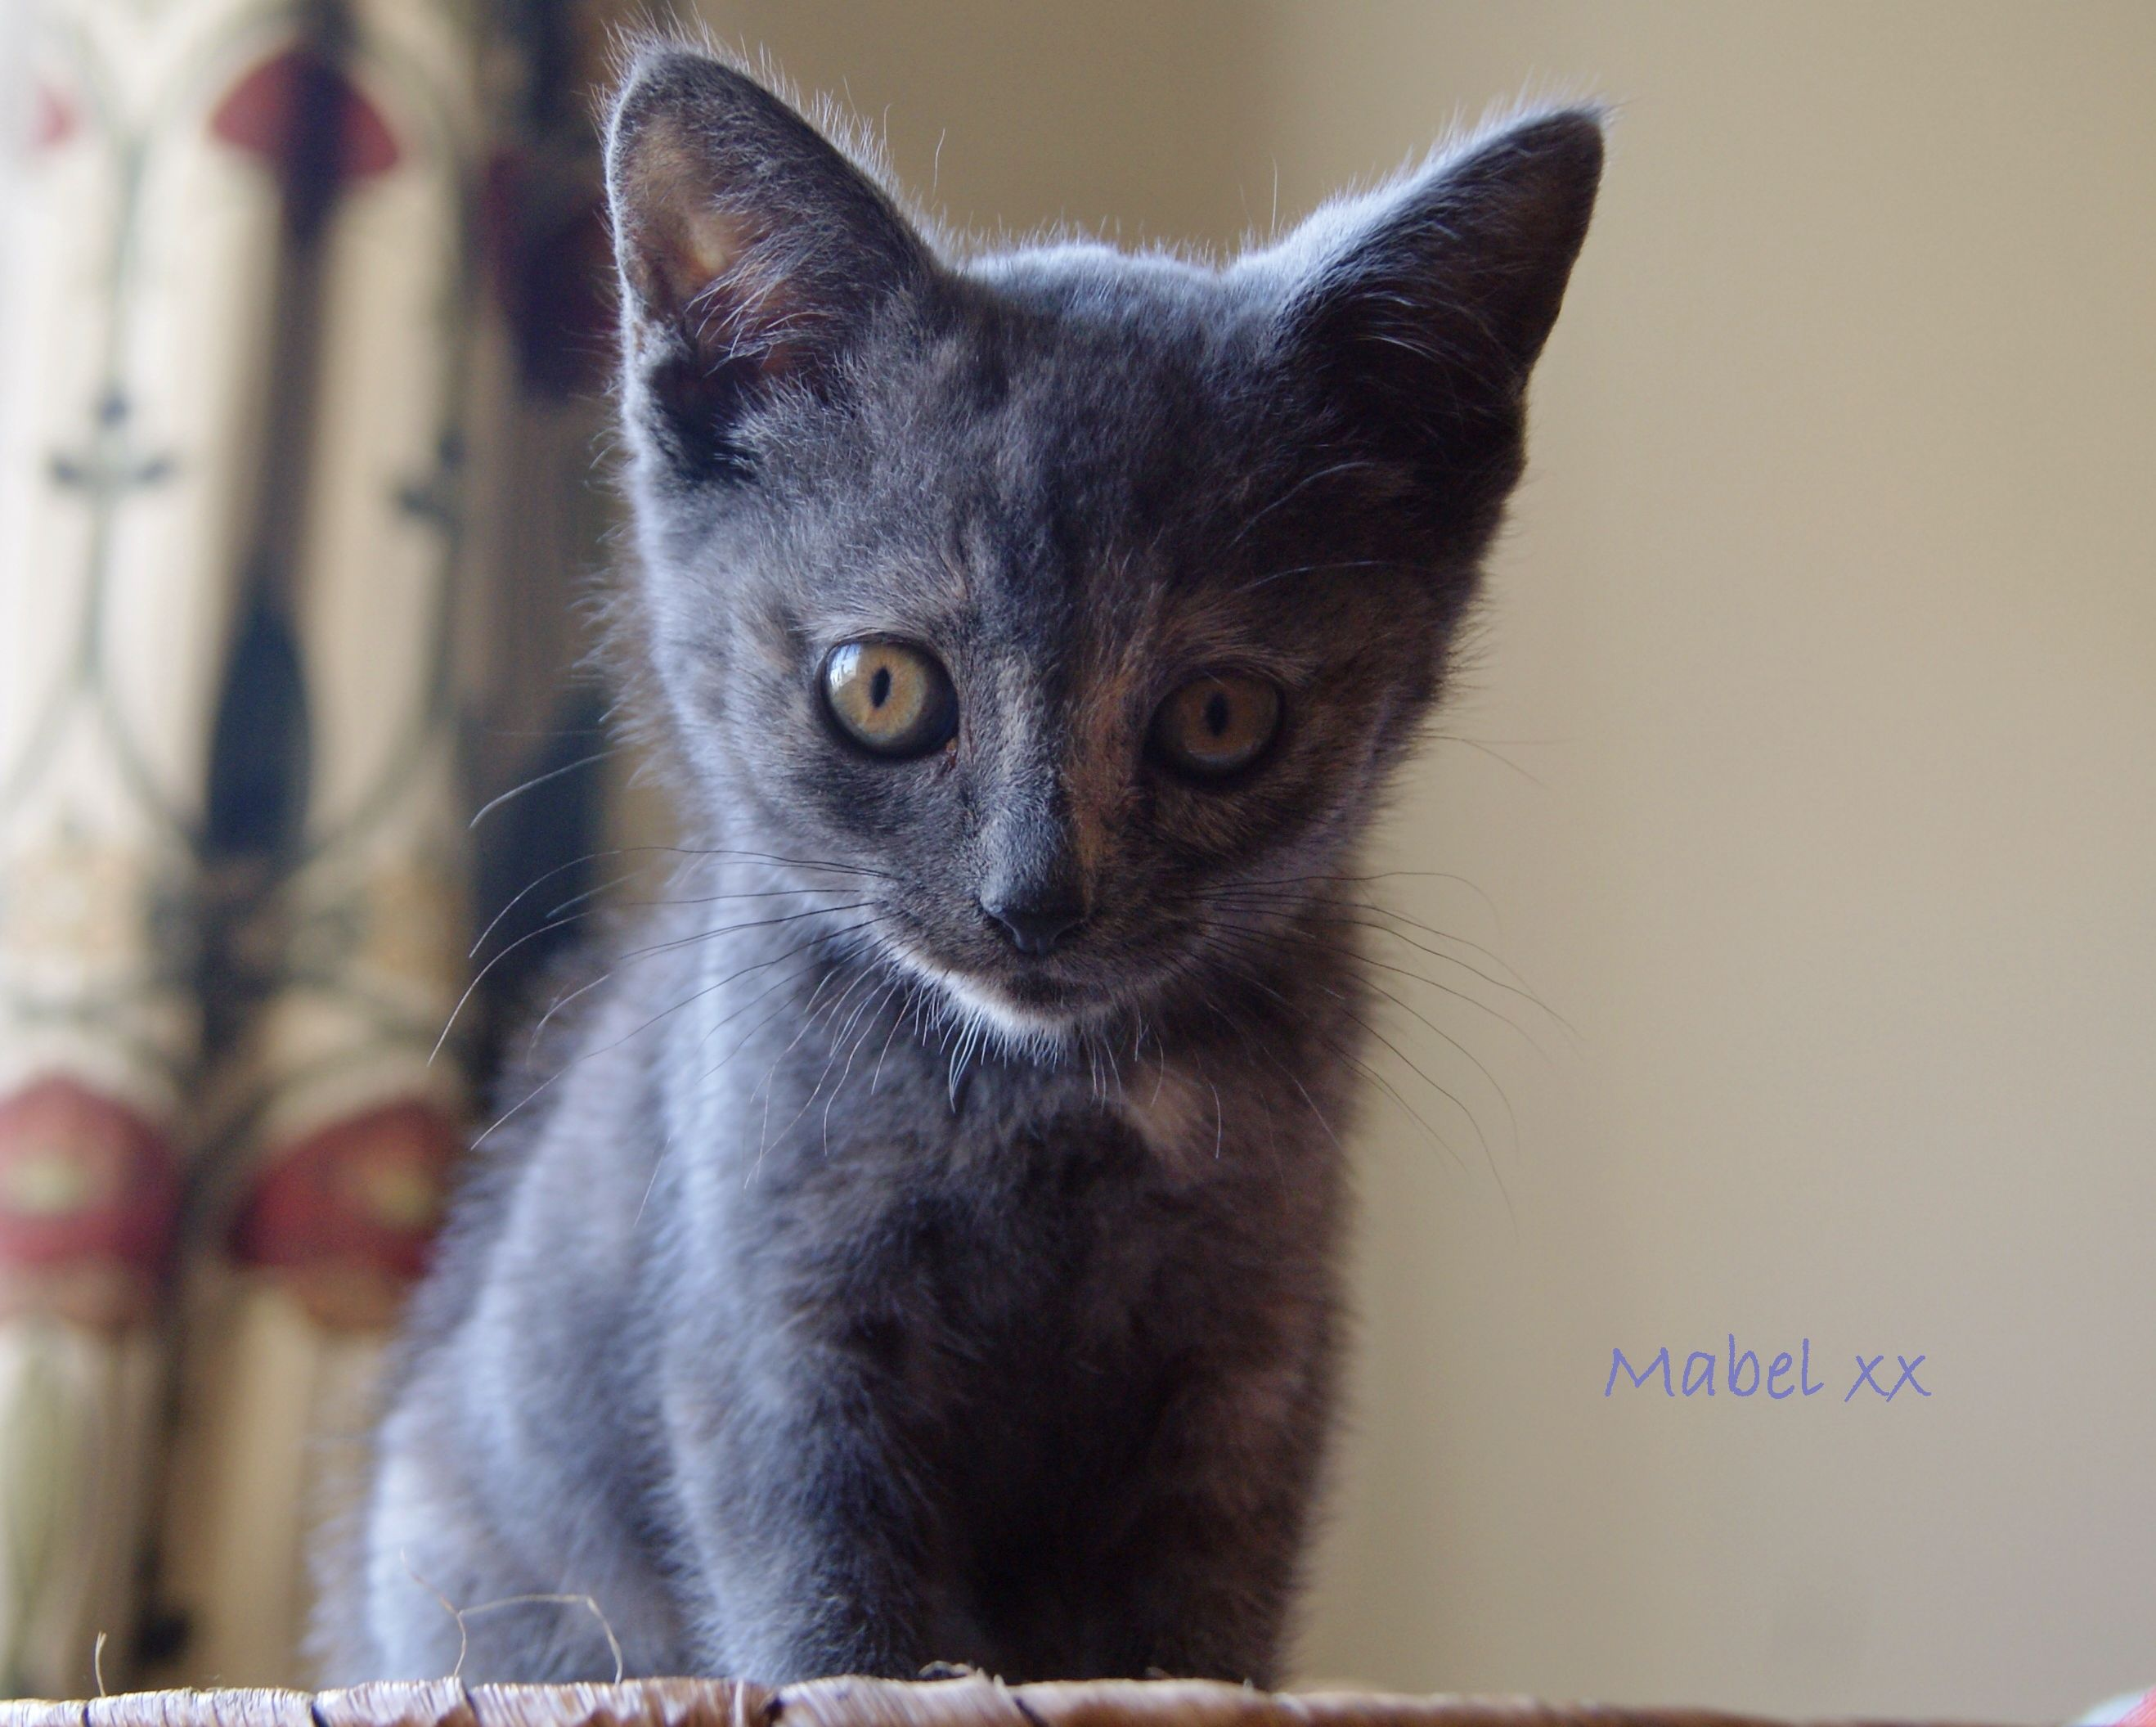 Mabel Our New 9 Week Old Dilute Tortie Rescue Kitten Kitten Rescue Kitten Animals